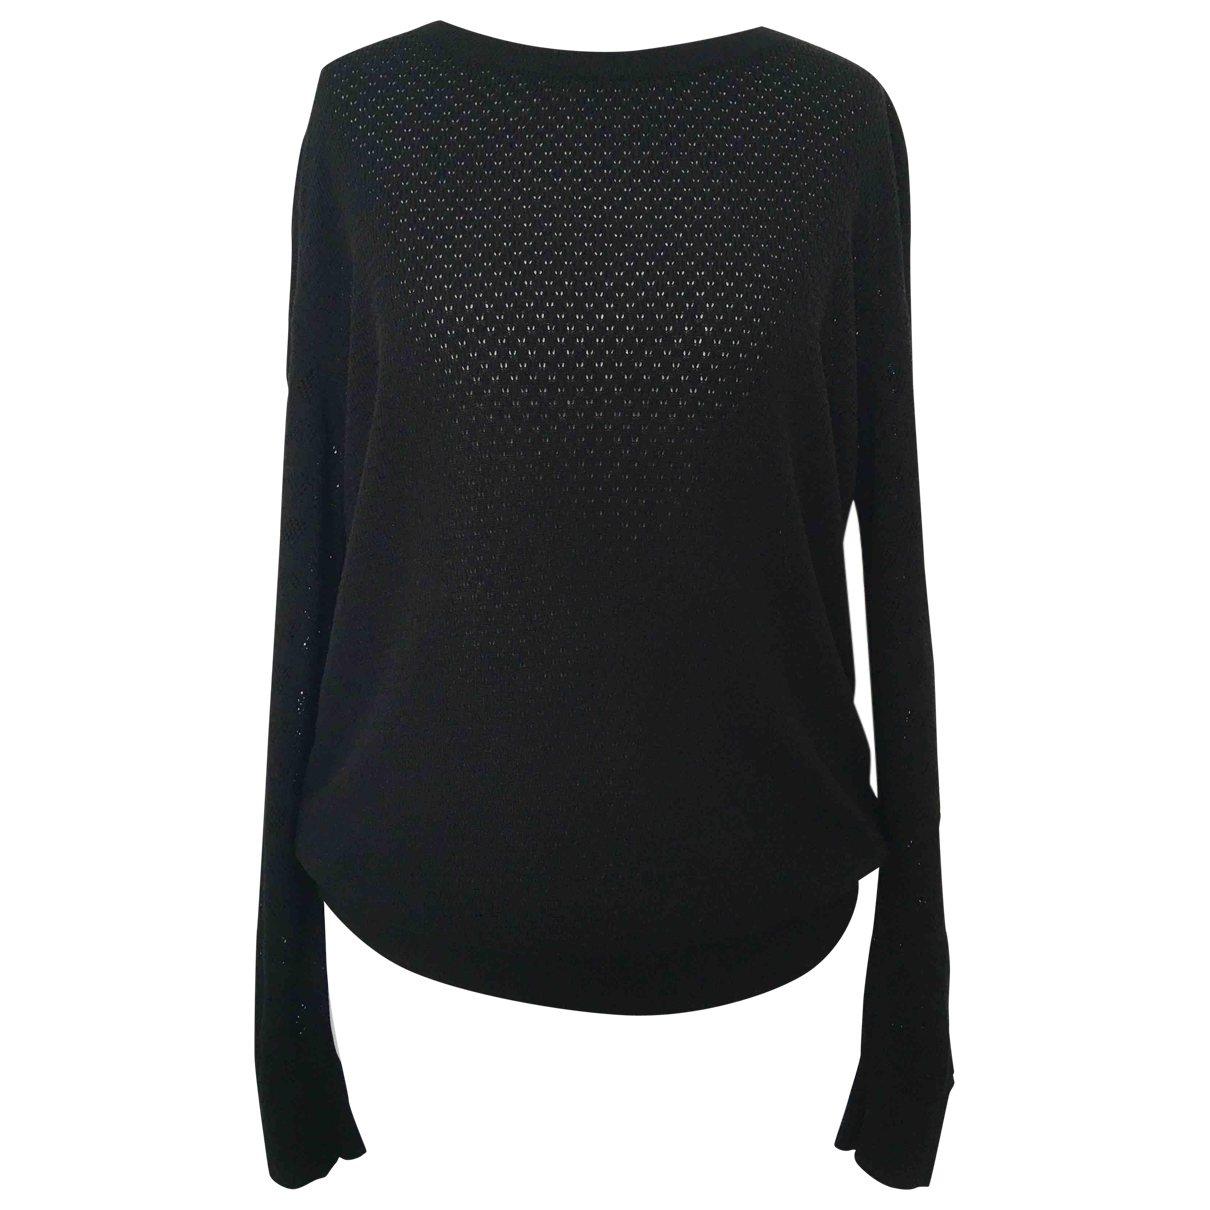 Apc \N Pullover in  Schwarz Synthetik